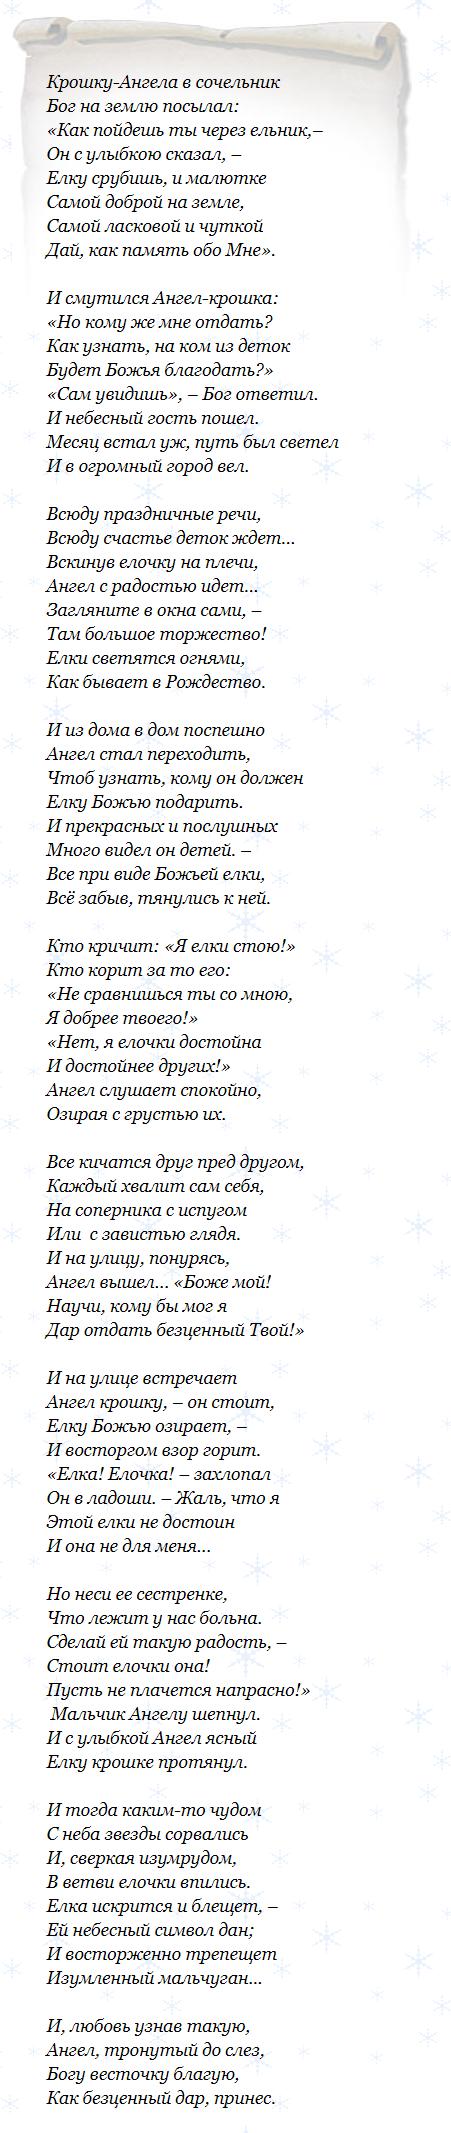 Божий дар. Федор Достоевский.